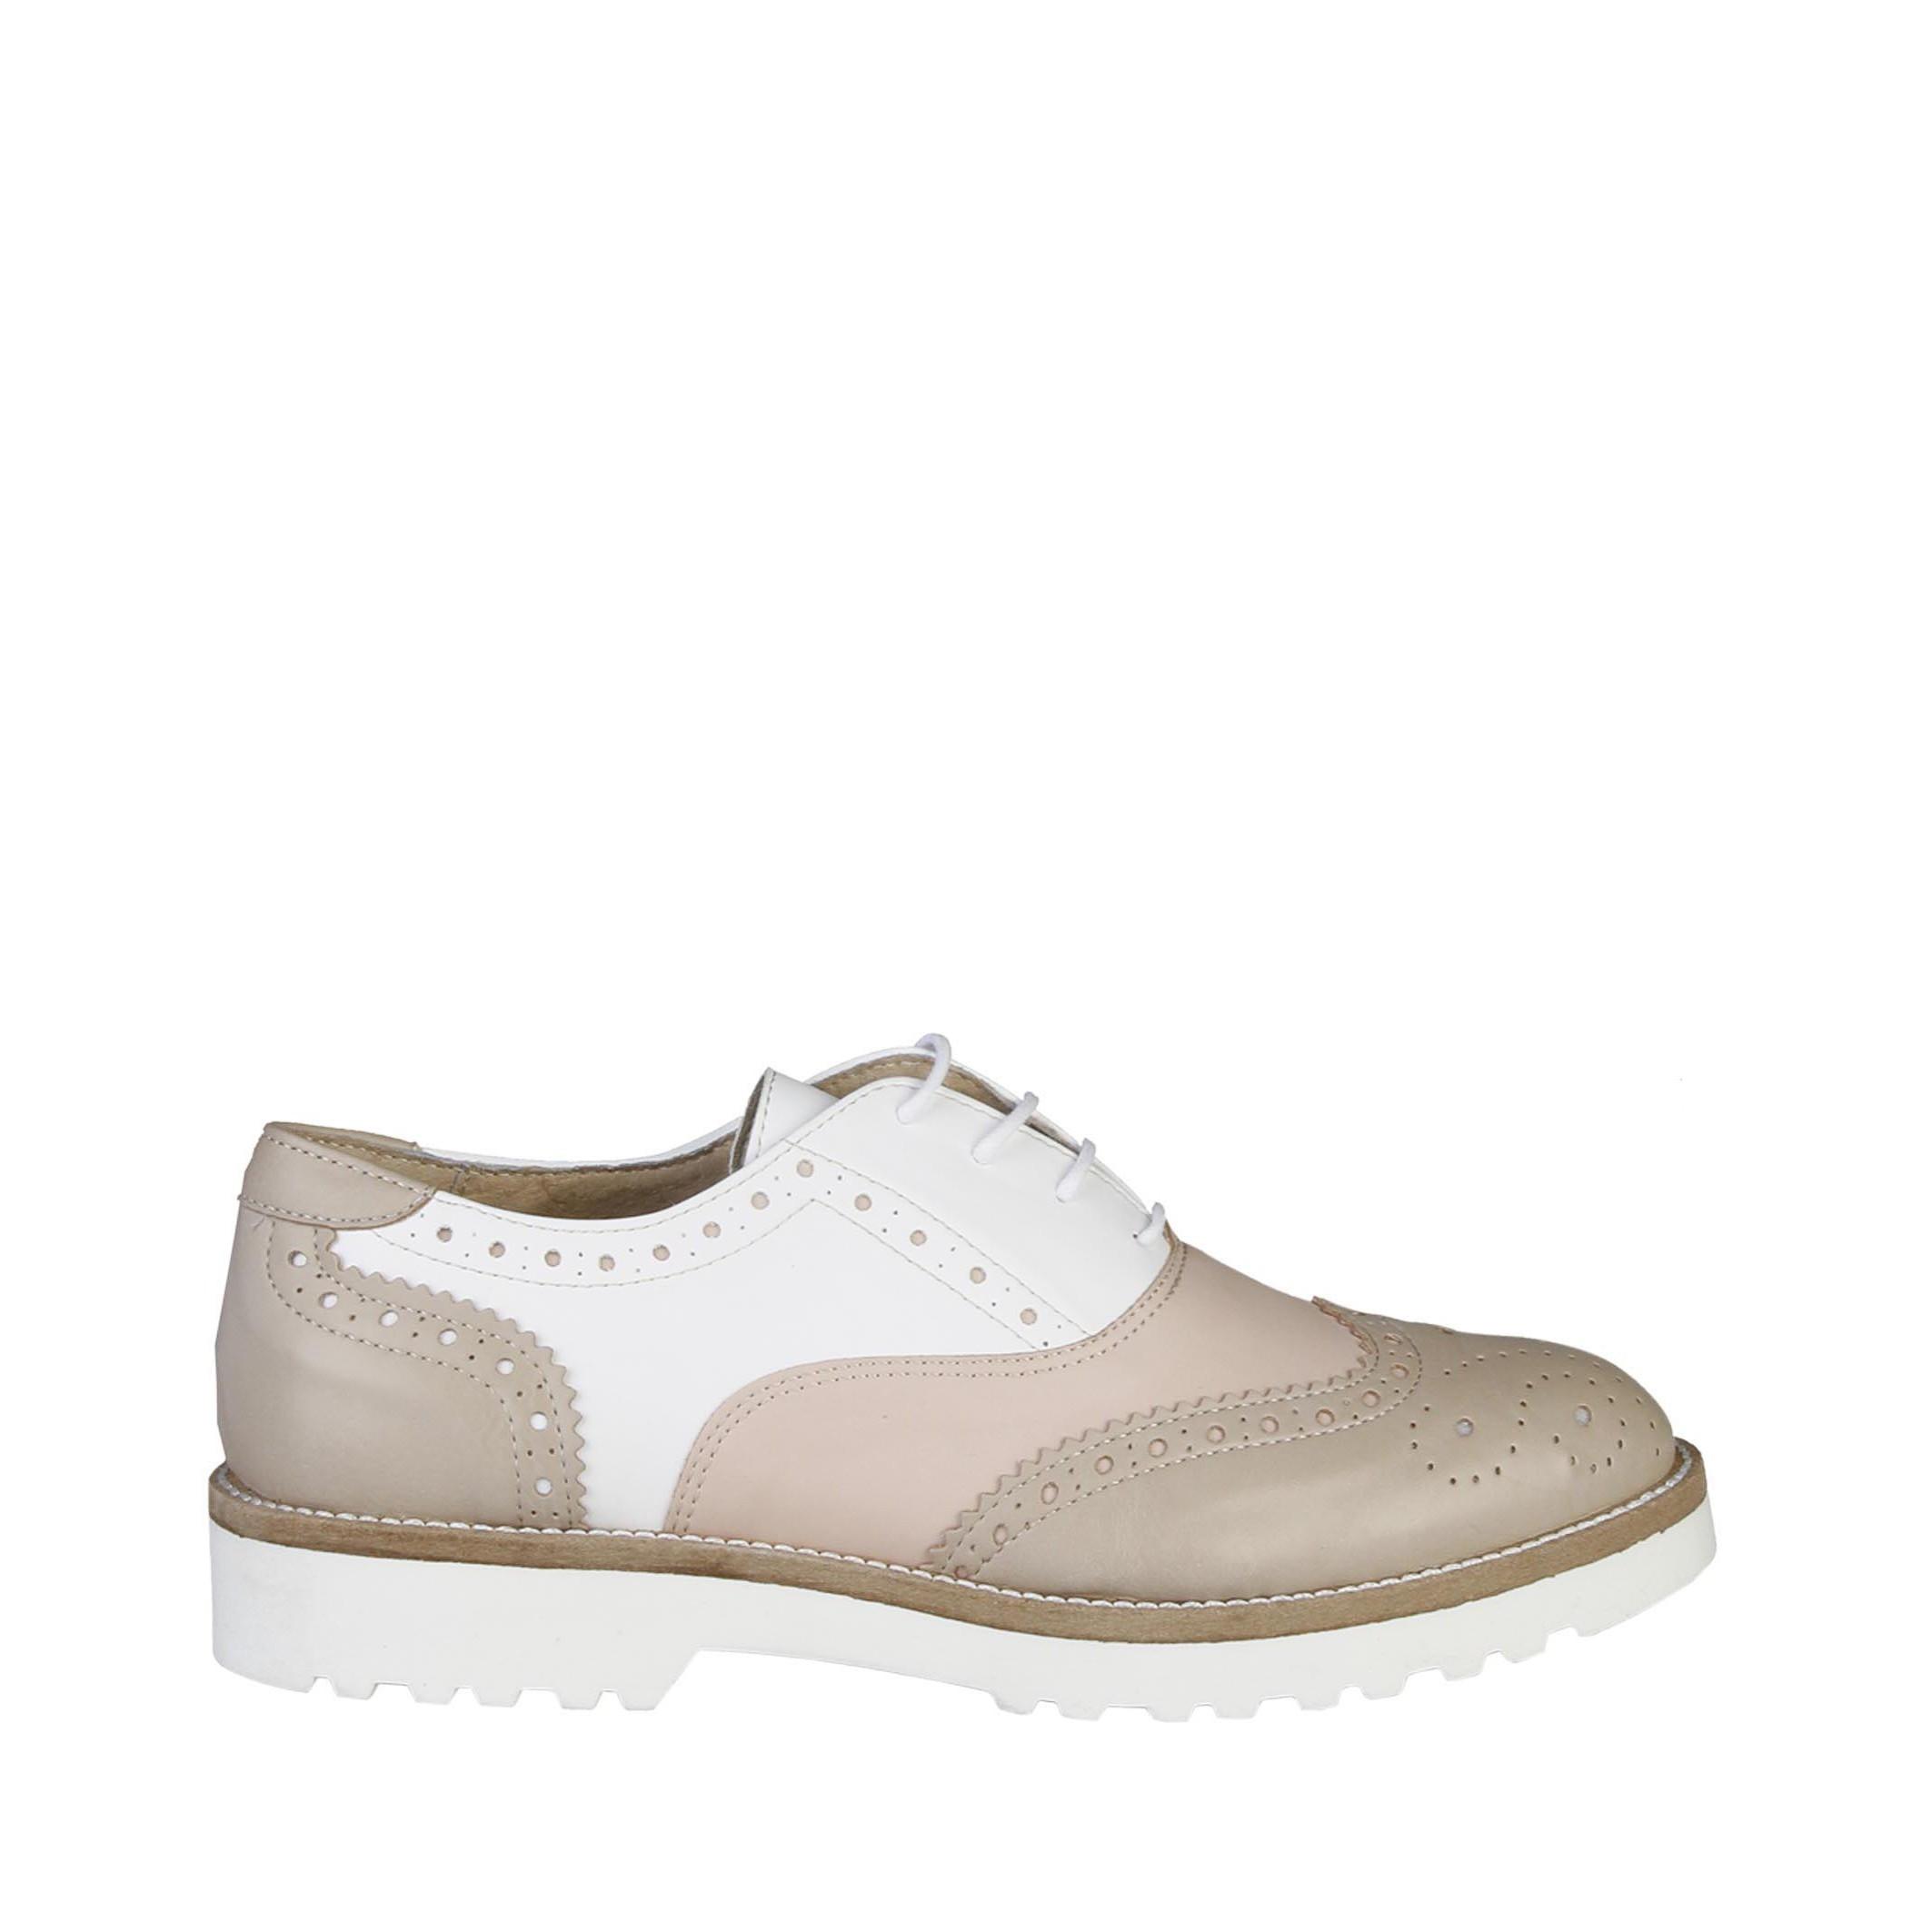 Chaussures Piampiani noires Casual femme  42 EU  42.5 EU Chaussures Piampiani noires Casual femme vUPYrLv